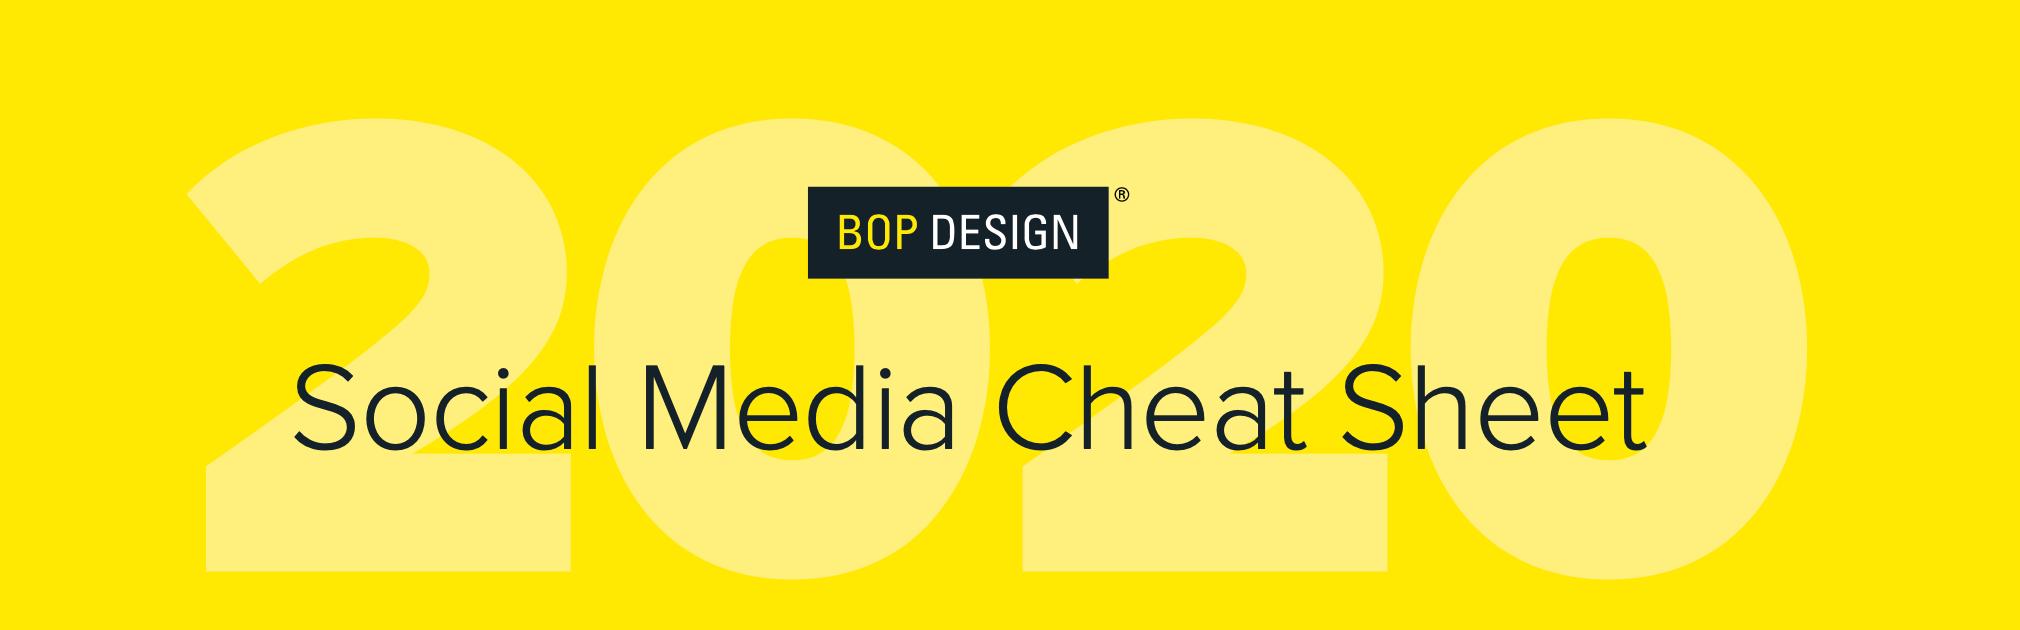 B2B Social Media Images Guide